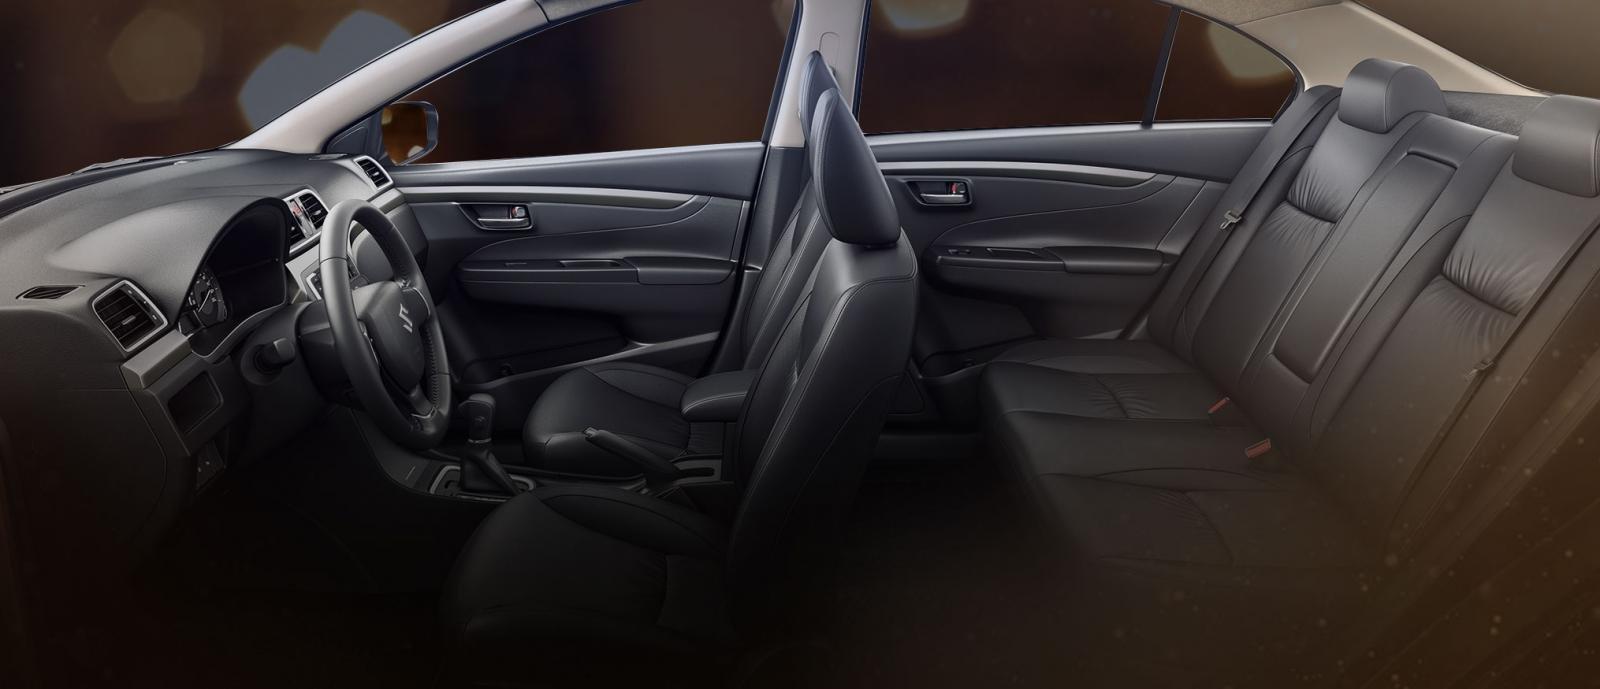 Toàn bộ ghế ngồi của Suzuki Ciaz 2019 bọc da màu đen a2